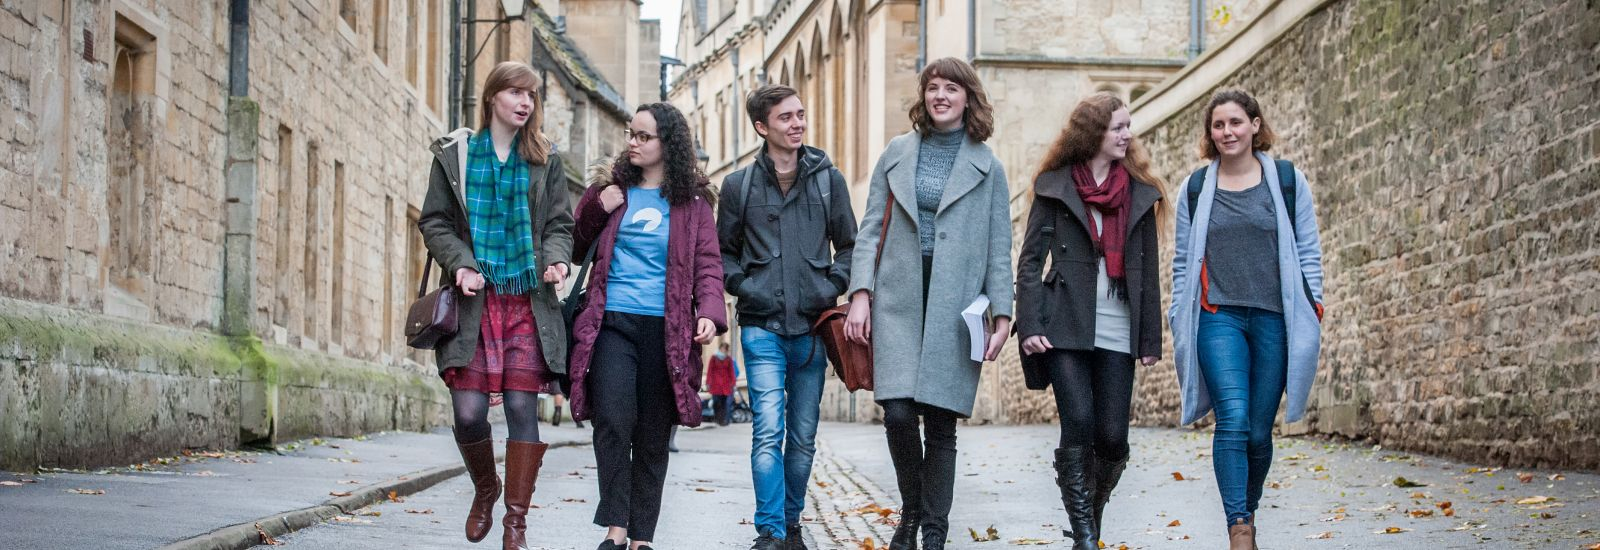 Six students walking to lecture along Brasenose Lane